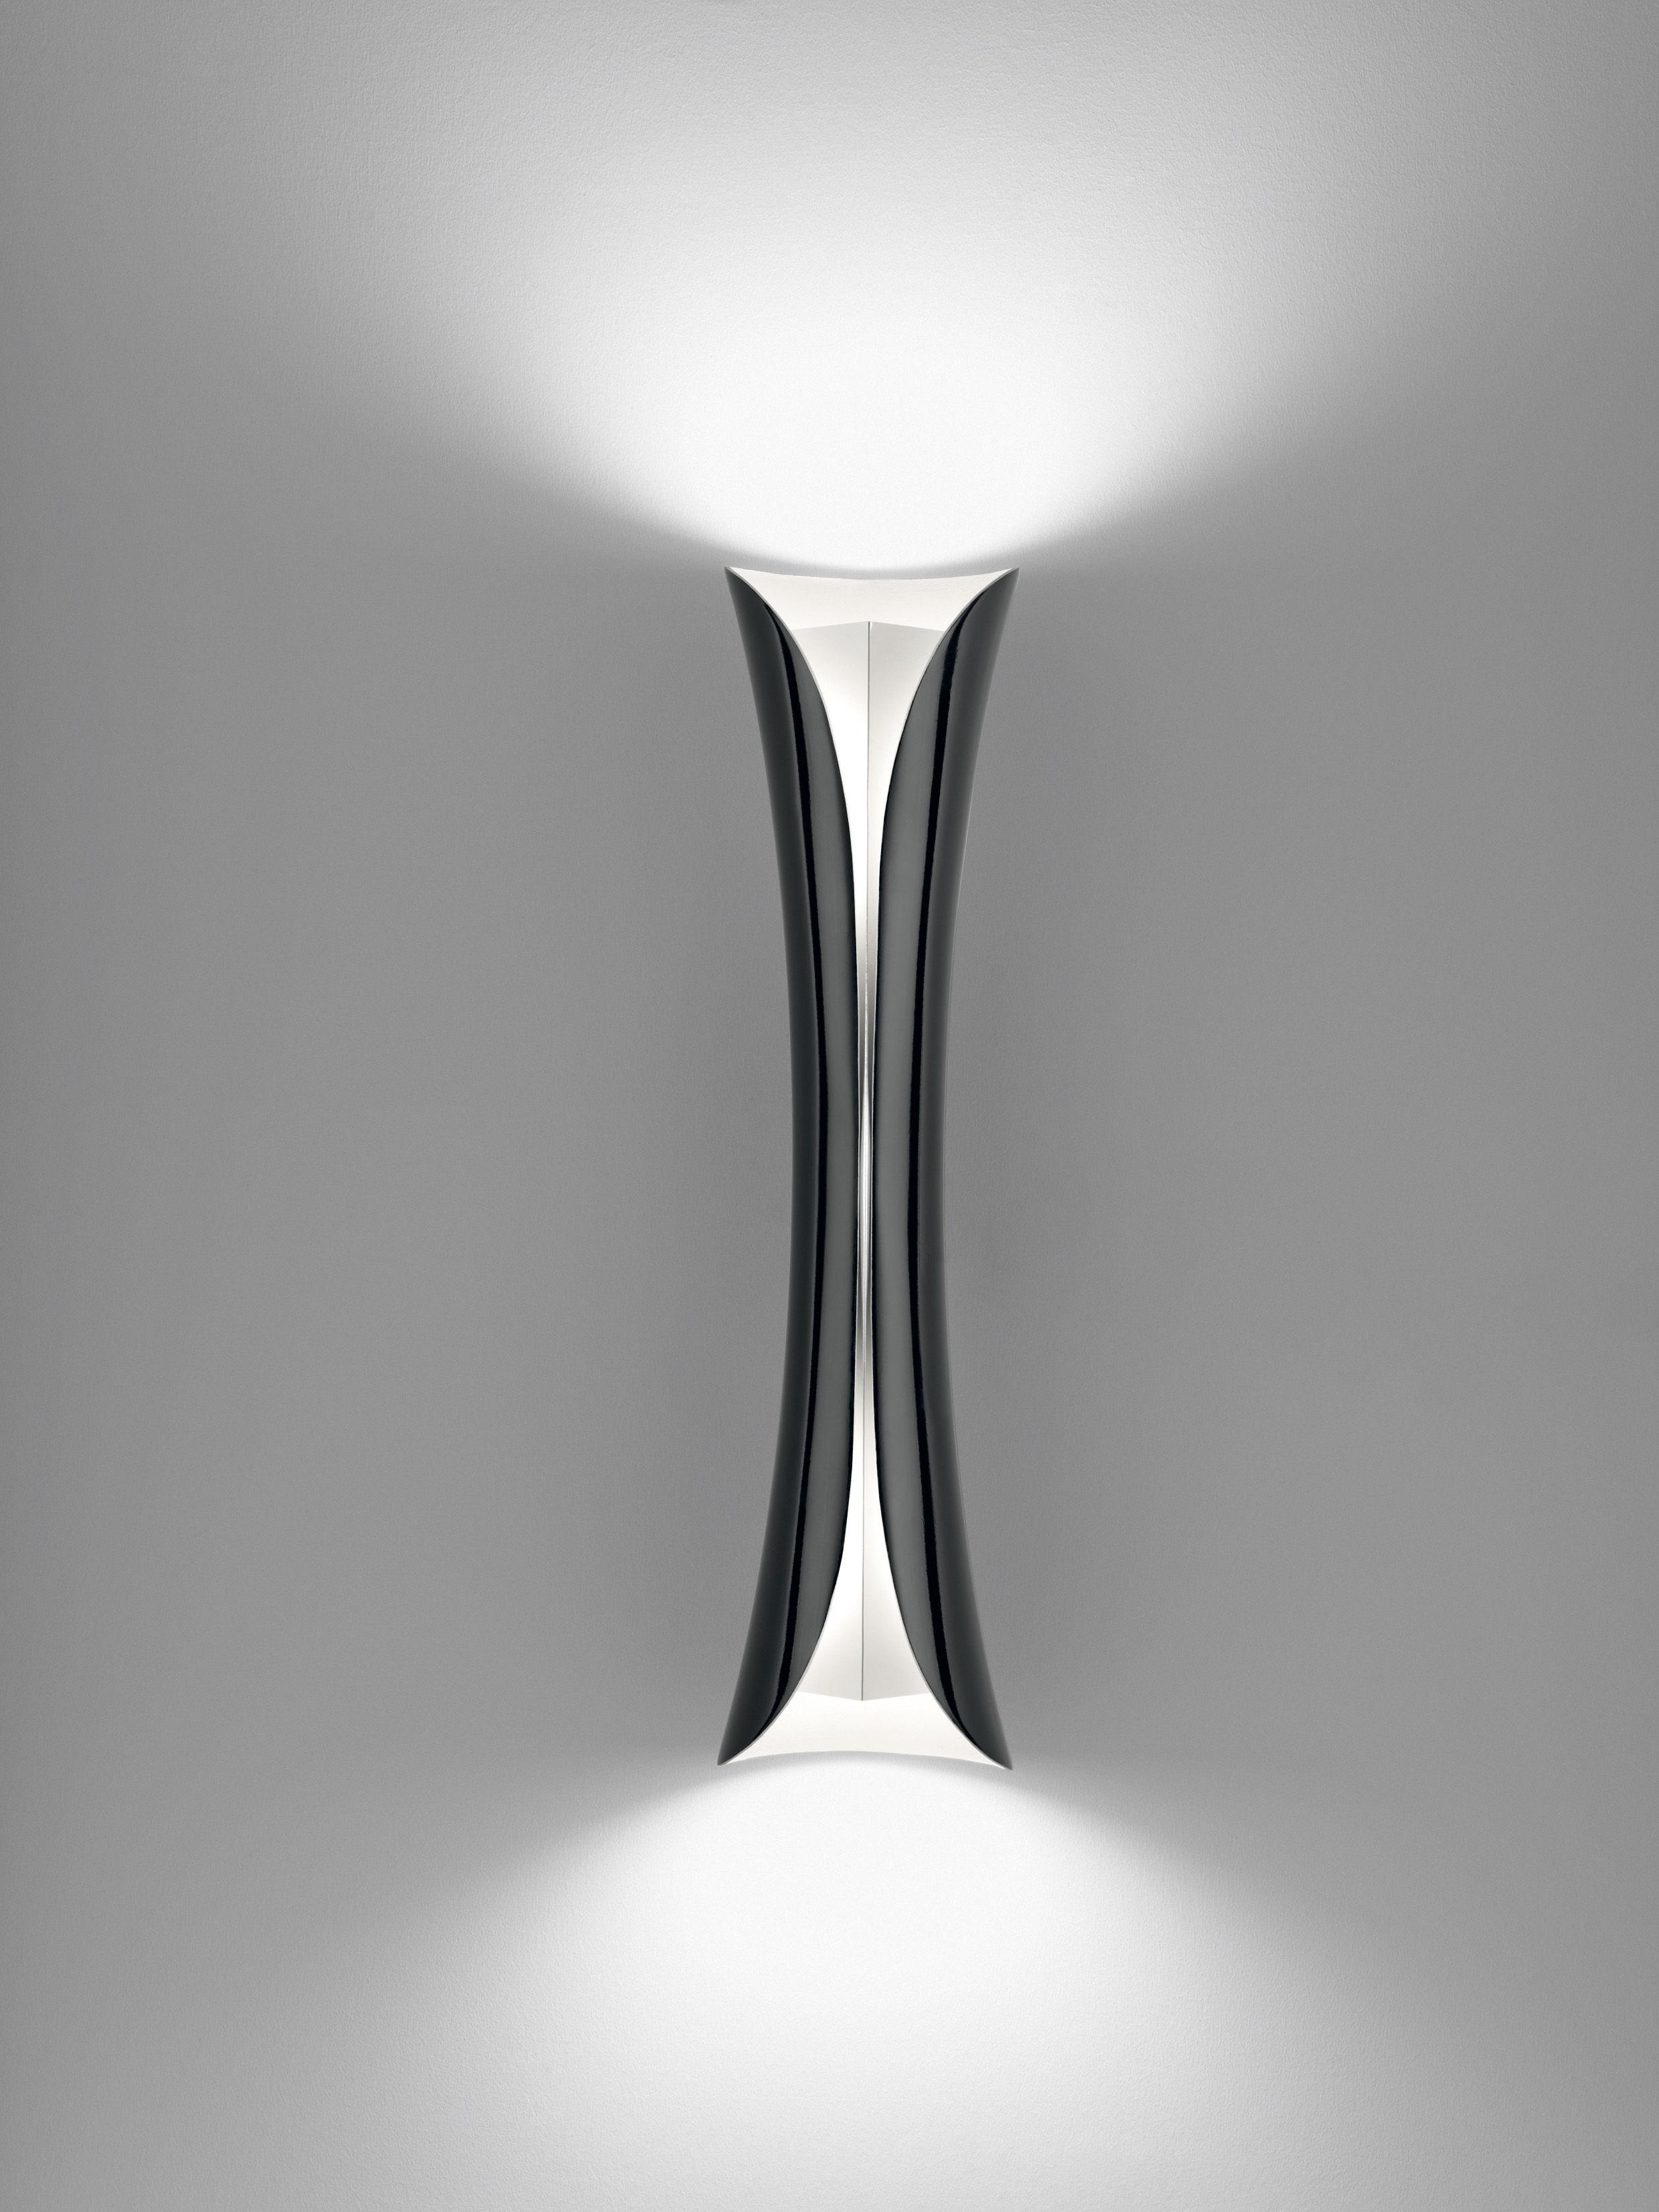 Leuchten - Wandleuchten - Cadmo LED Wandleuchte - Artemide - Schwarz - Aluminium, Matériau thermoplastique